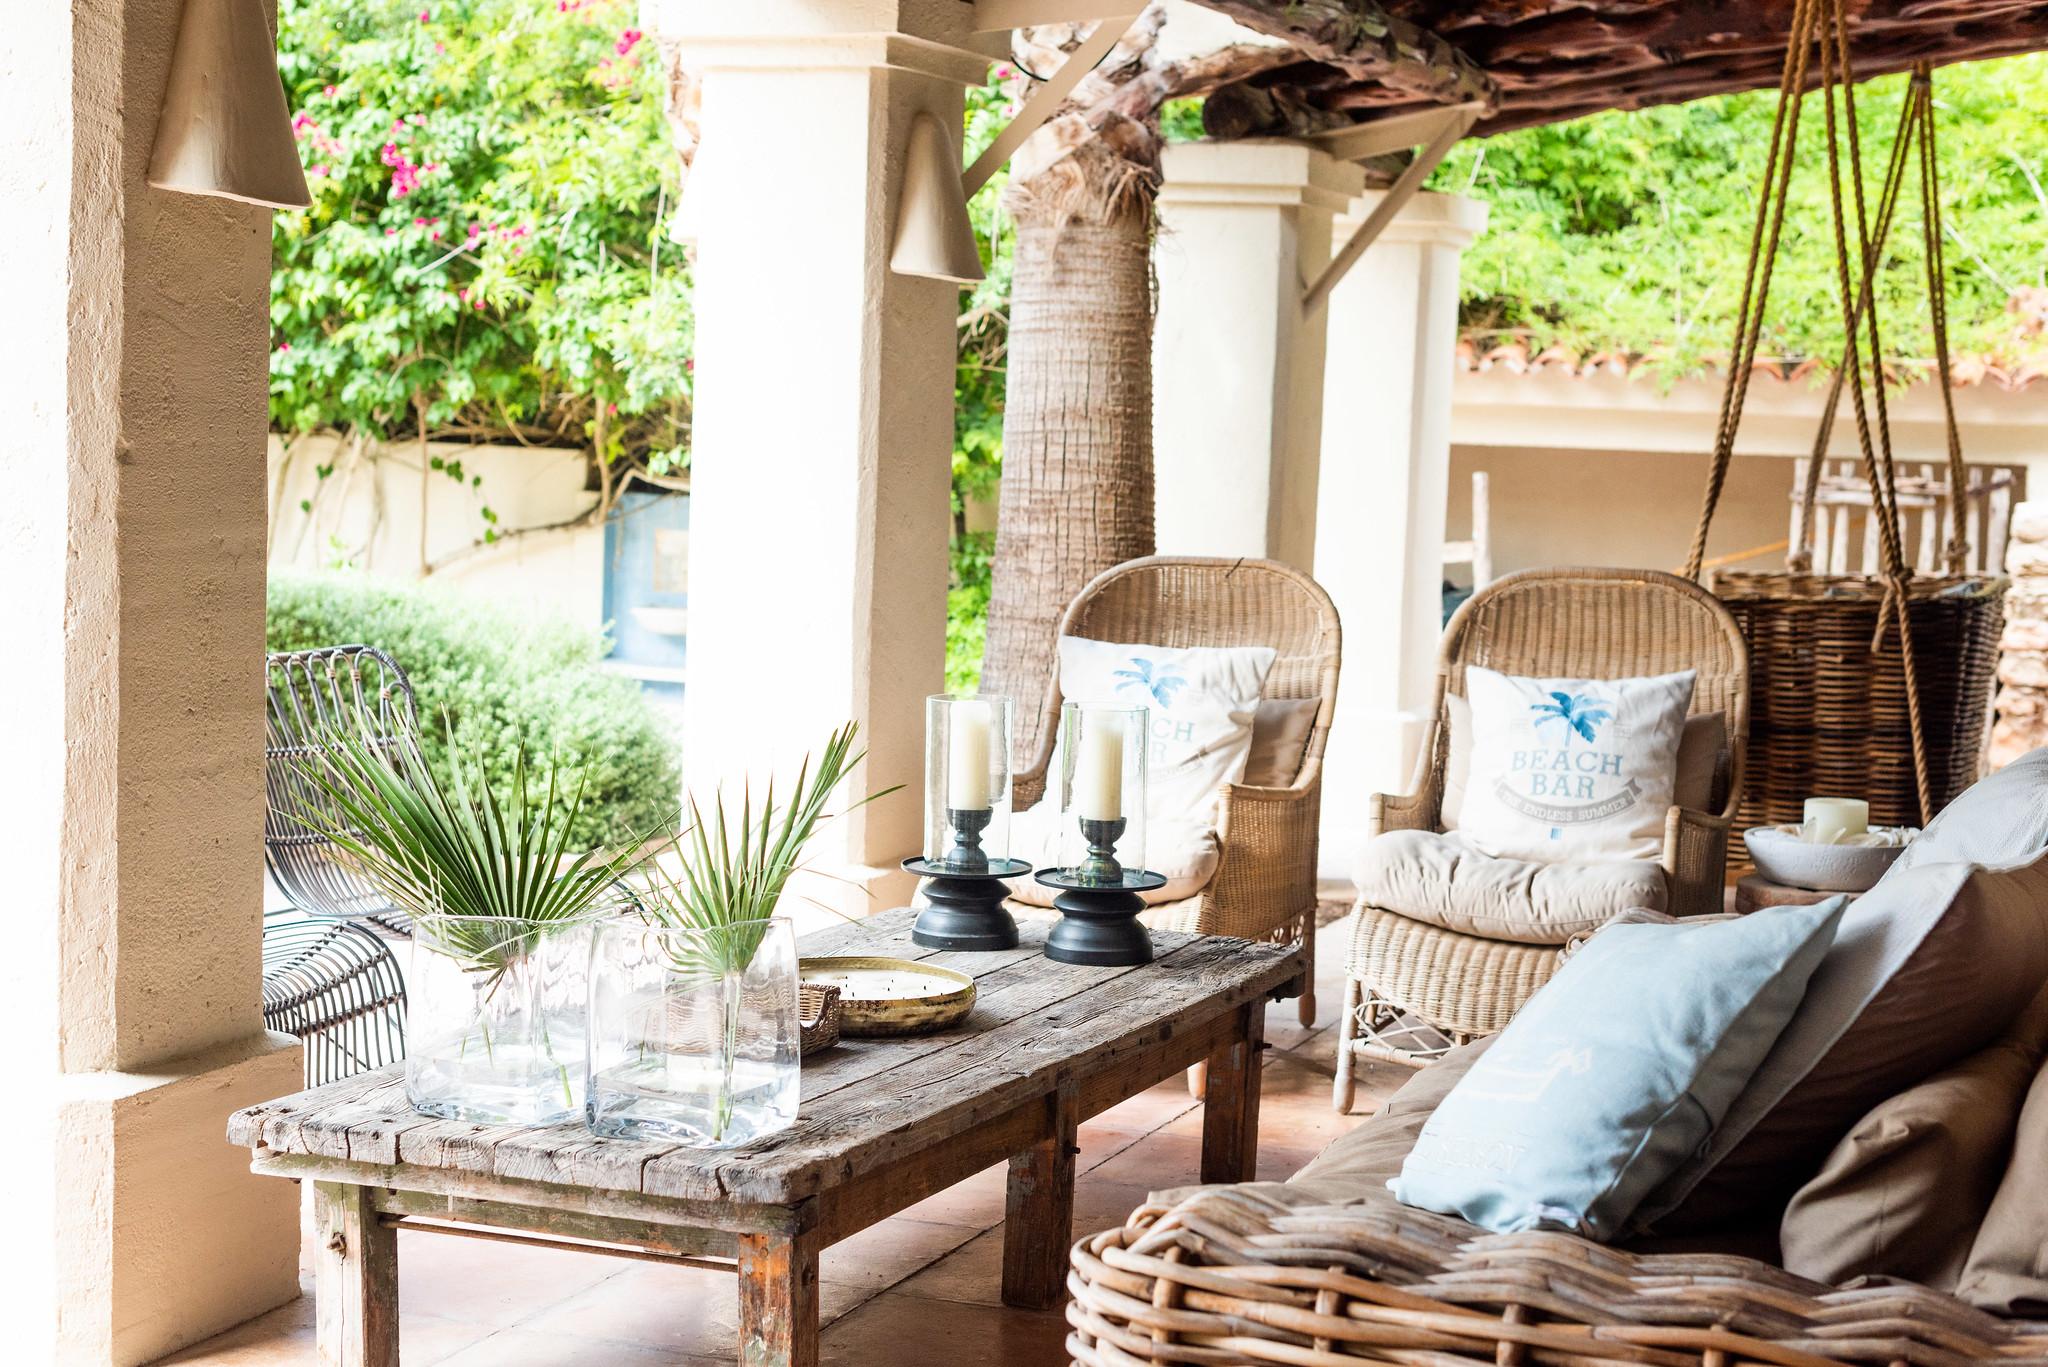 https://www.white-ibiza.com/wp-content/uploads/2020/05/white-ibiza-villas-can-riviere-exterior-sofa2.jpg